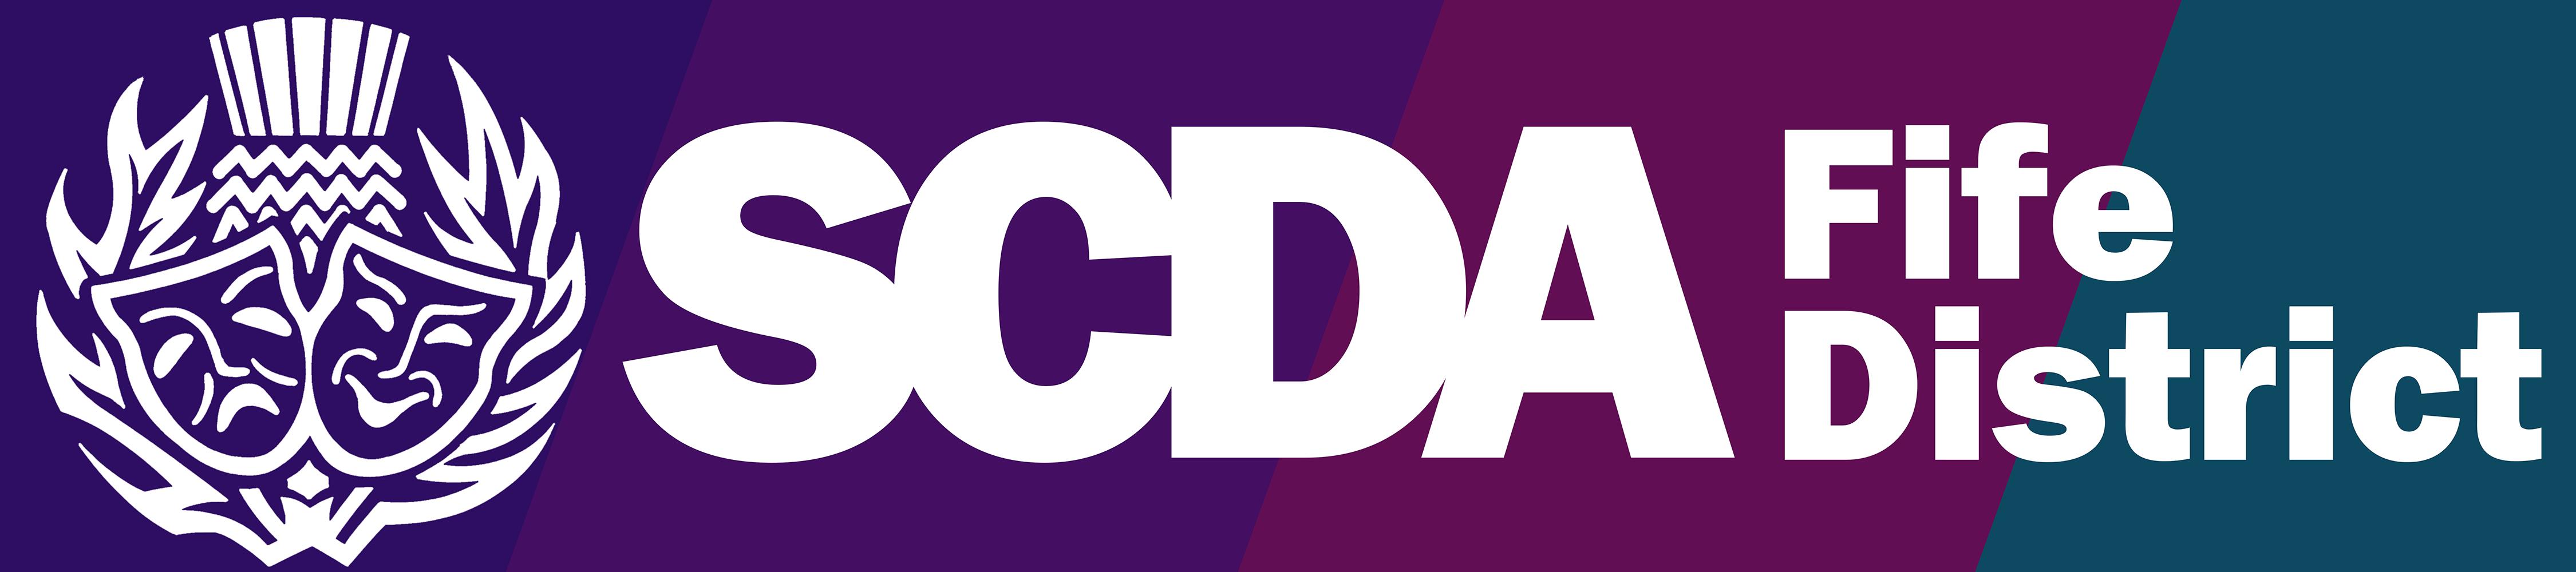 SCDA Fife Logo